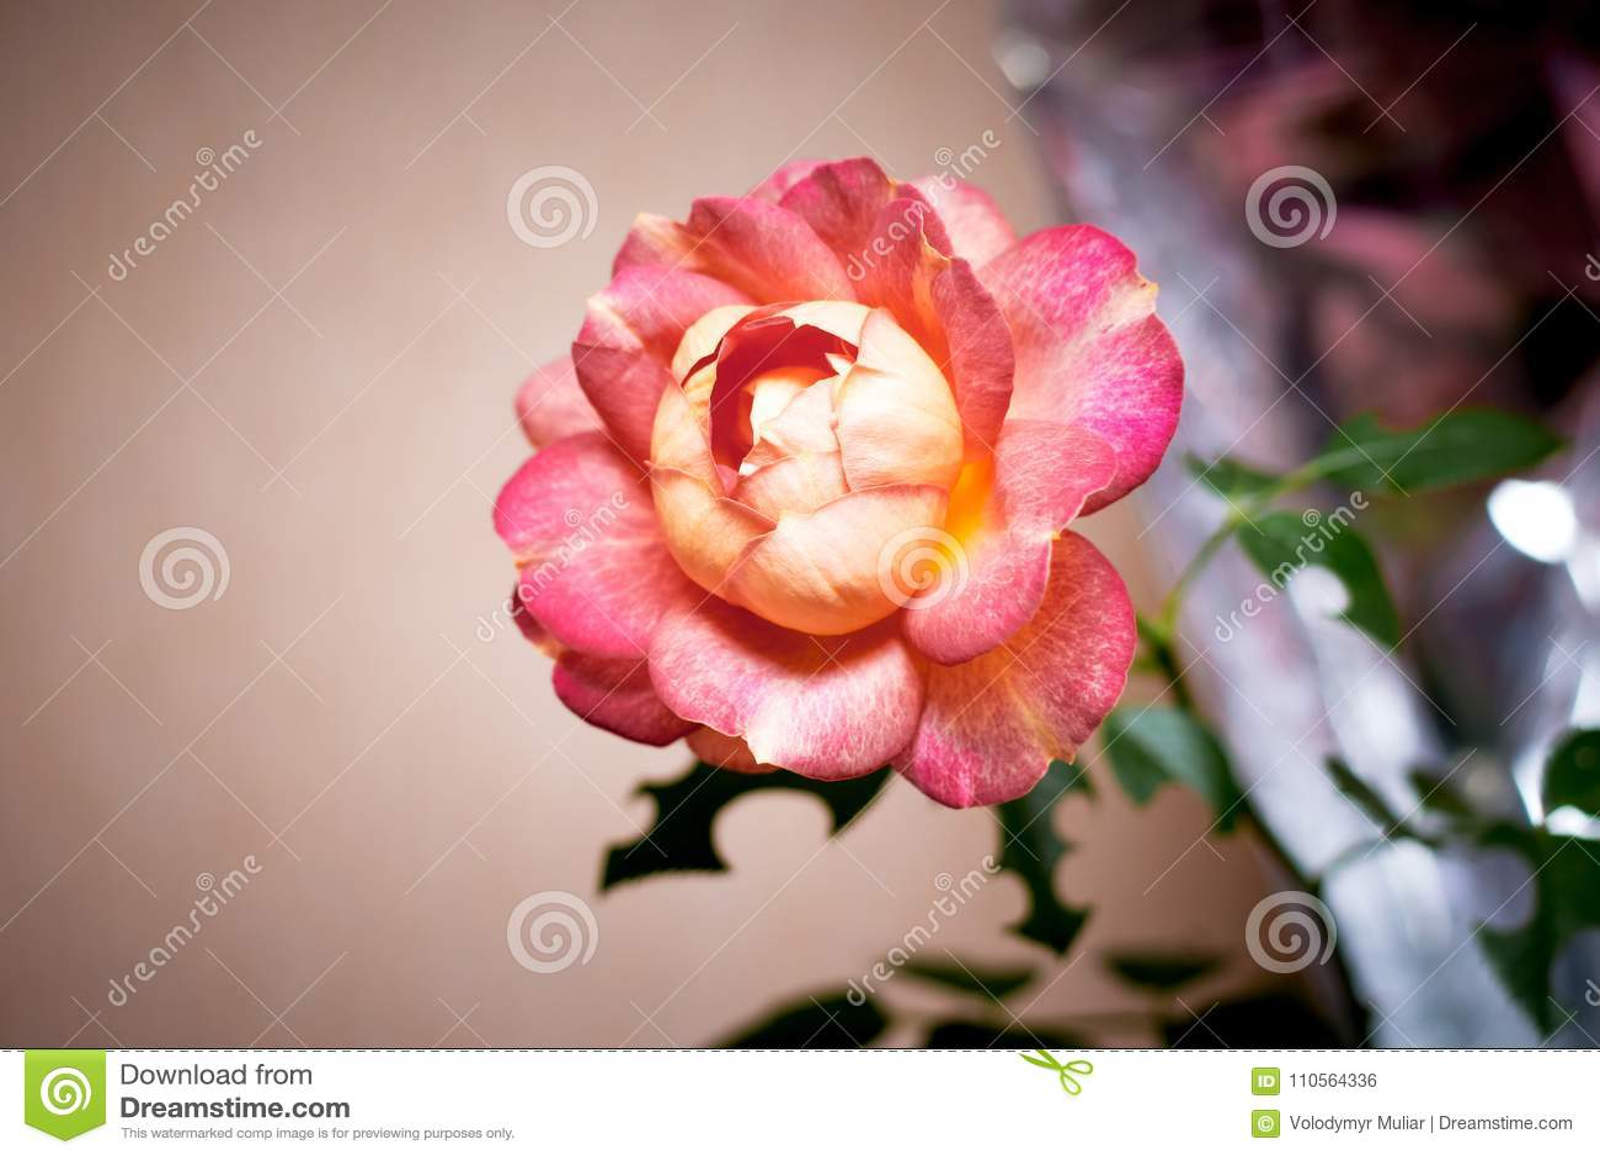 Elegant Flower Of Rose, Gift For Holiday, Wedding, Birthday Stock ...